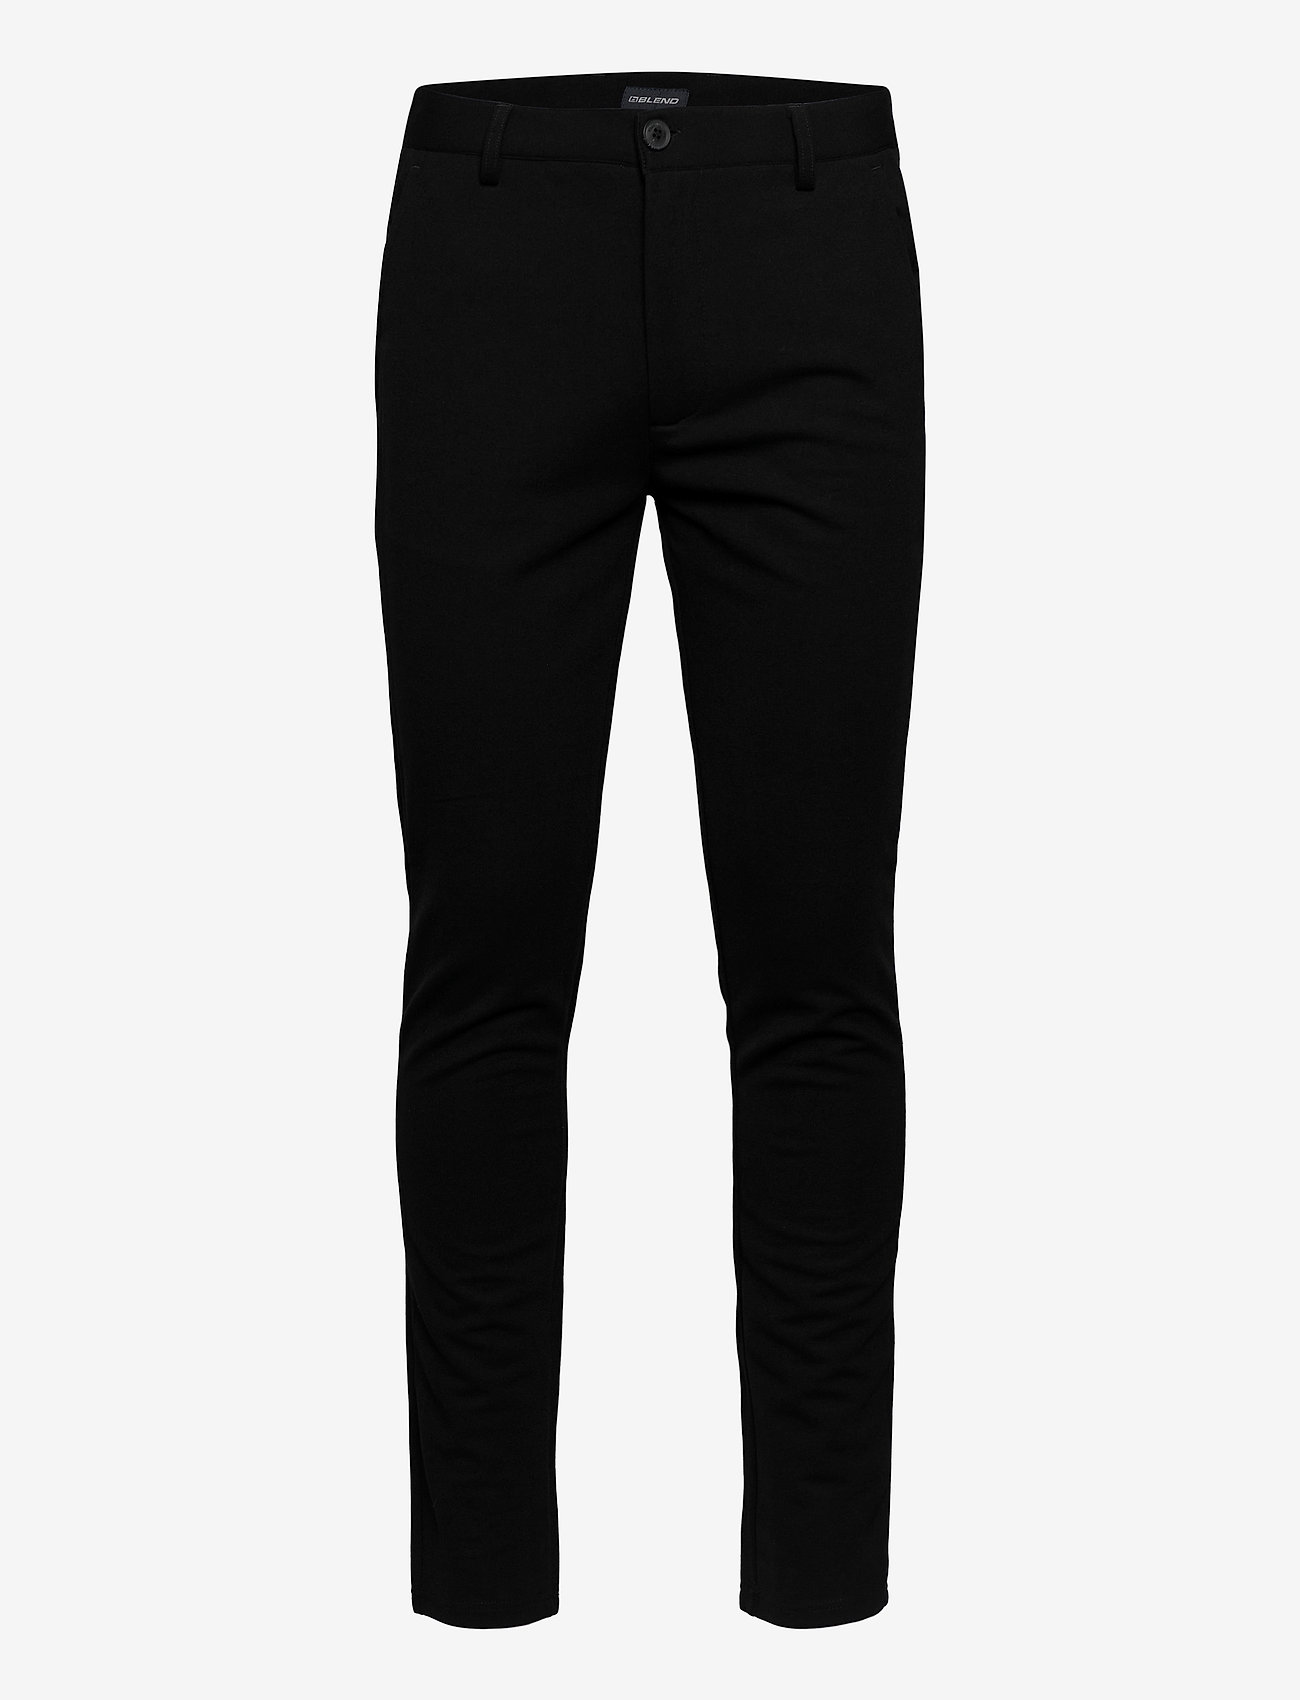 Blend - Pants - od garnituru - black - 0